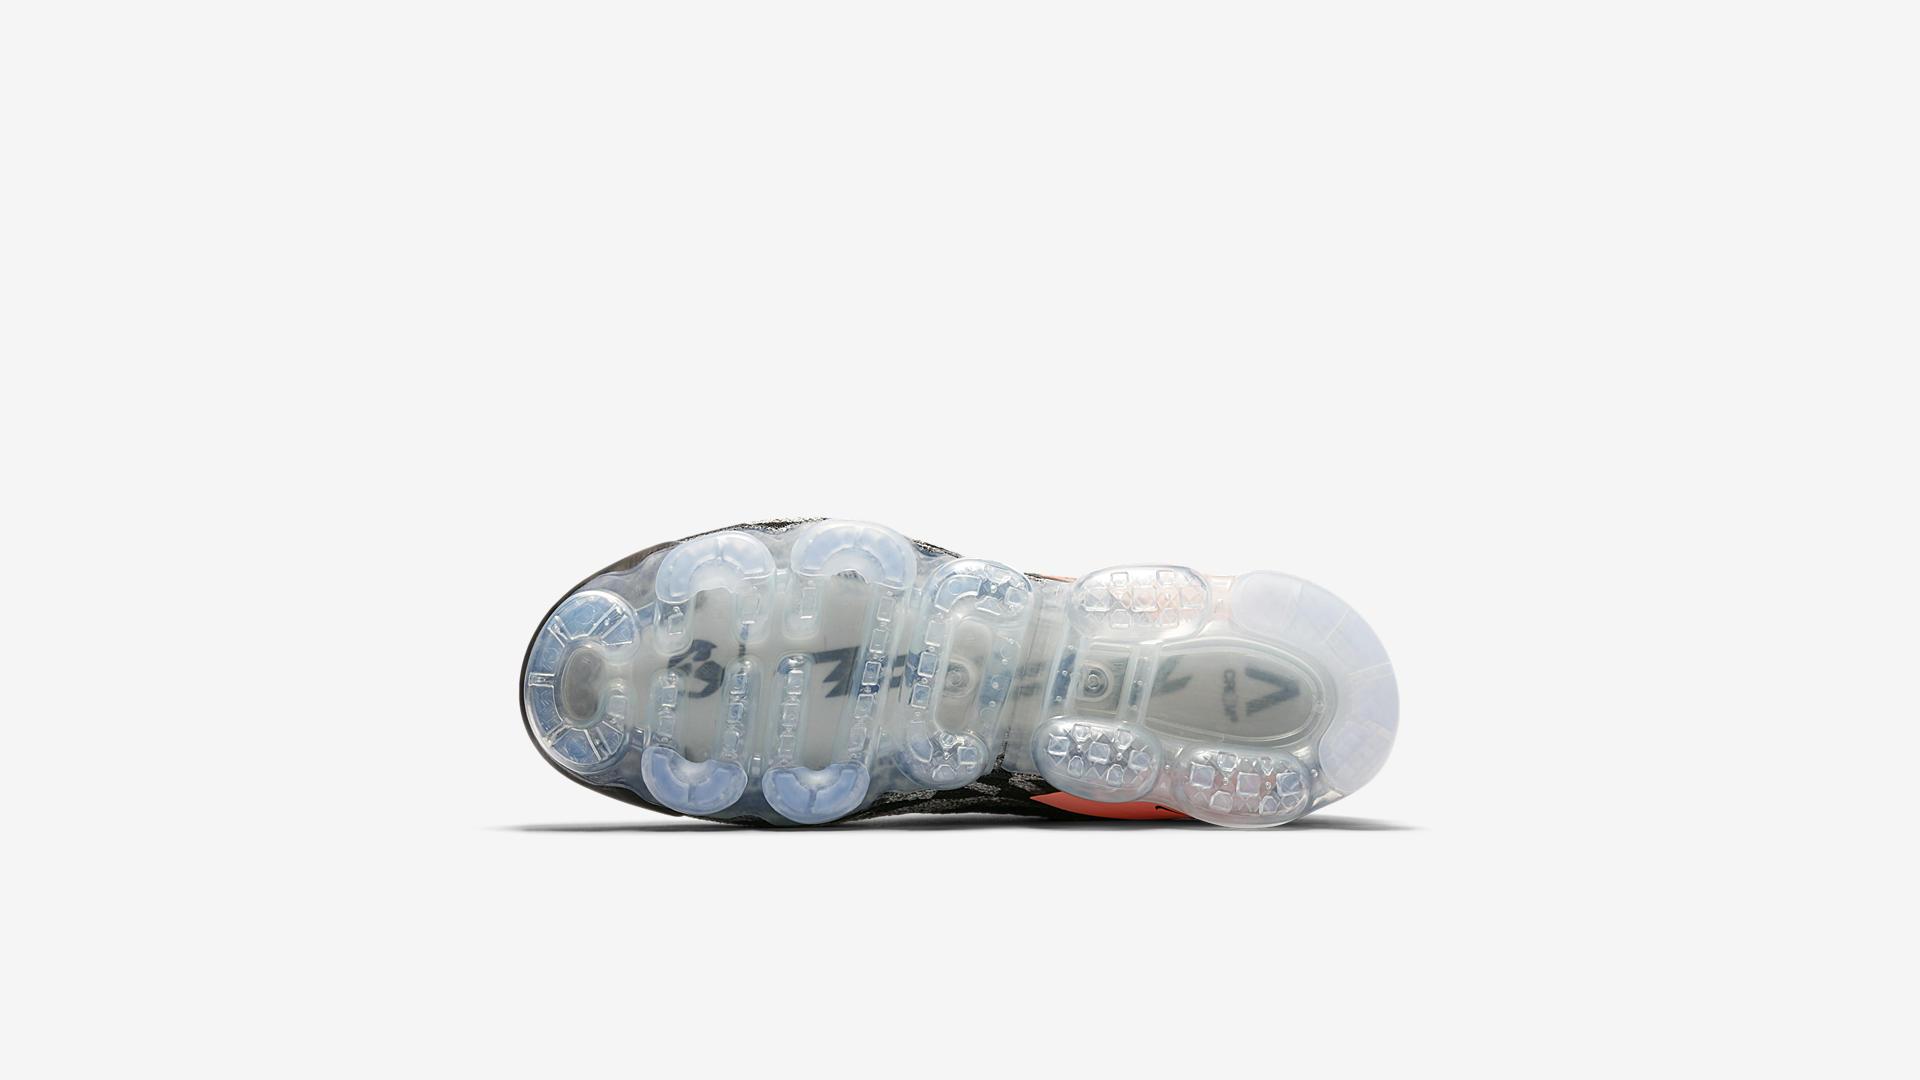 AQ0996 102 ACRONYM x Nike Air Vapormax Moc 2 Thirsty Bandit 4